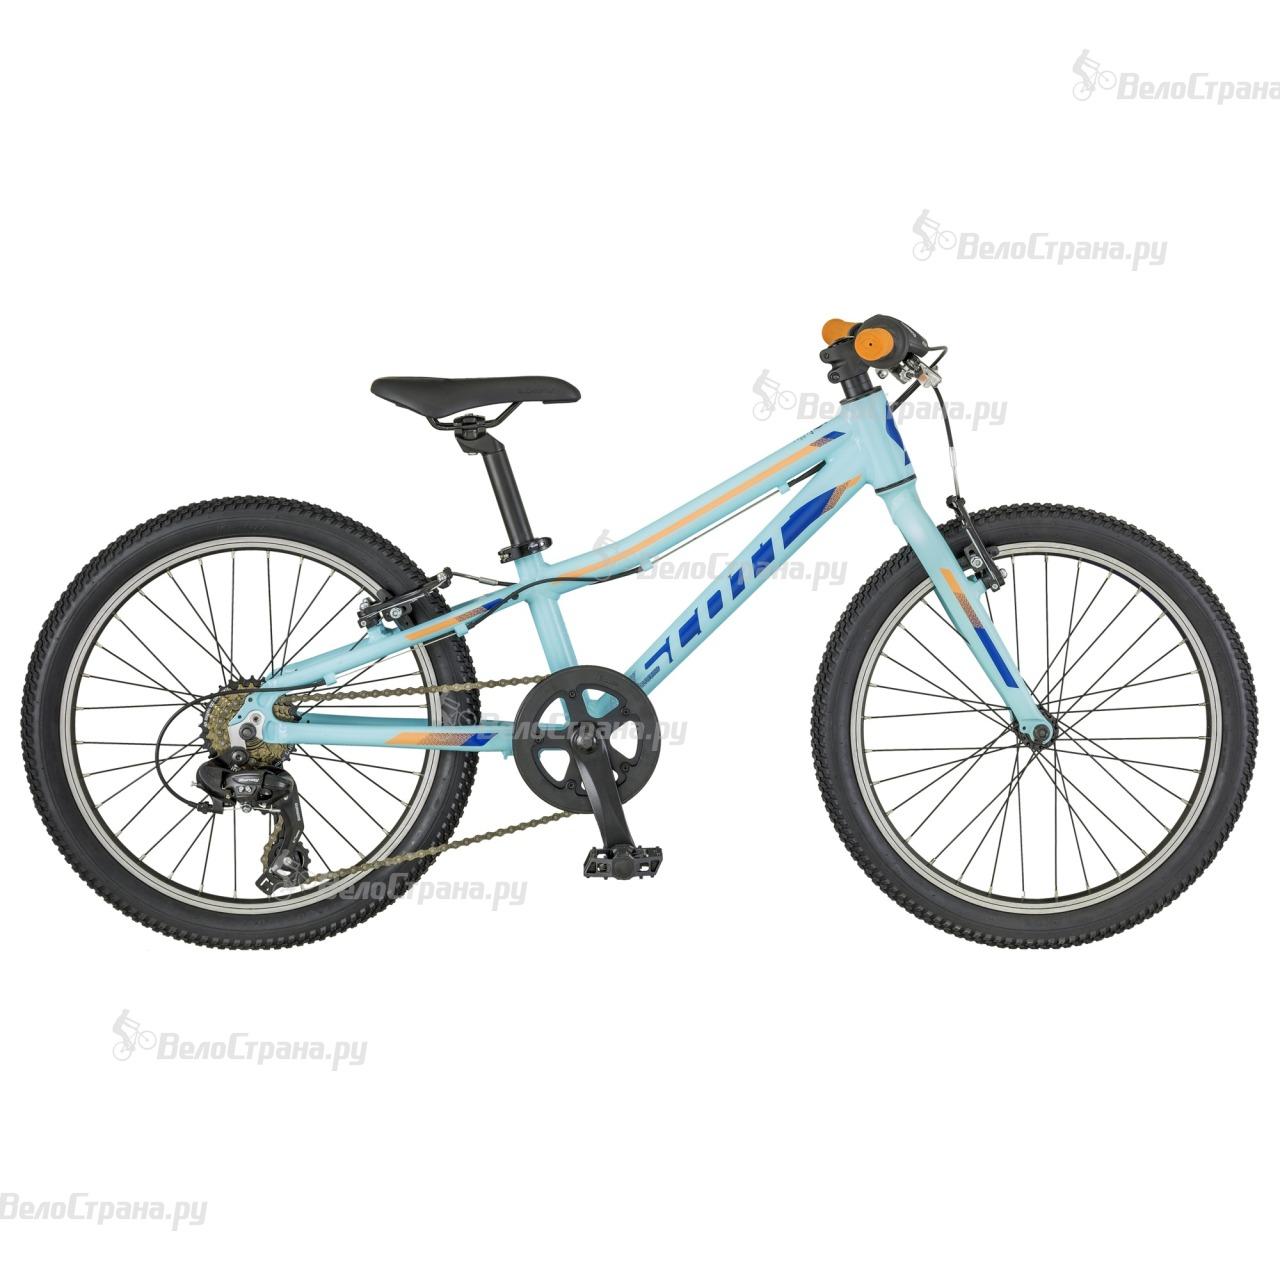 Велосипед Scott Contessa JR 20 rigid fork (2018)